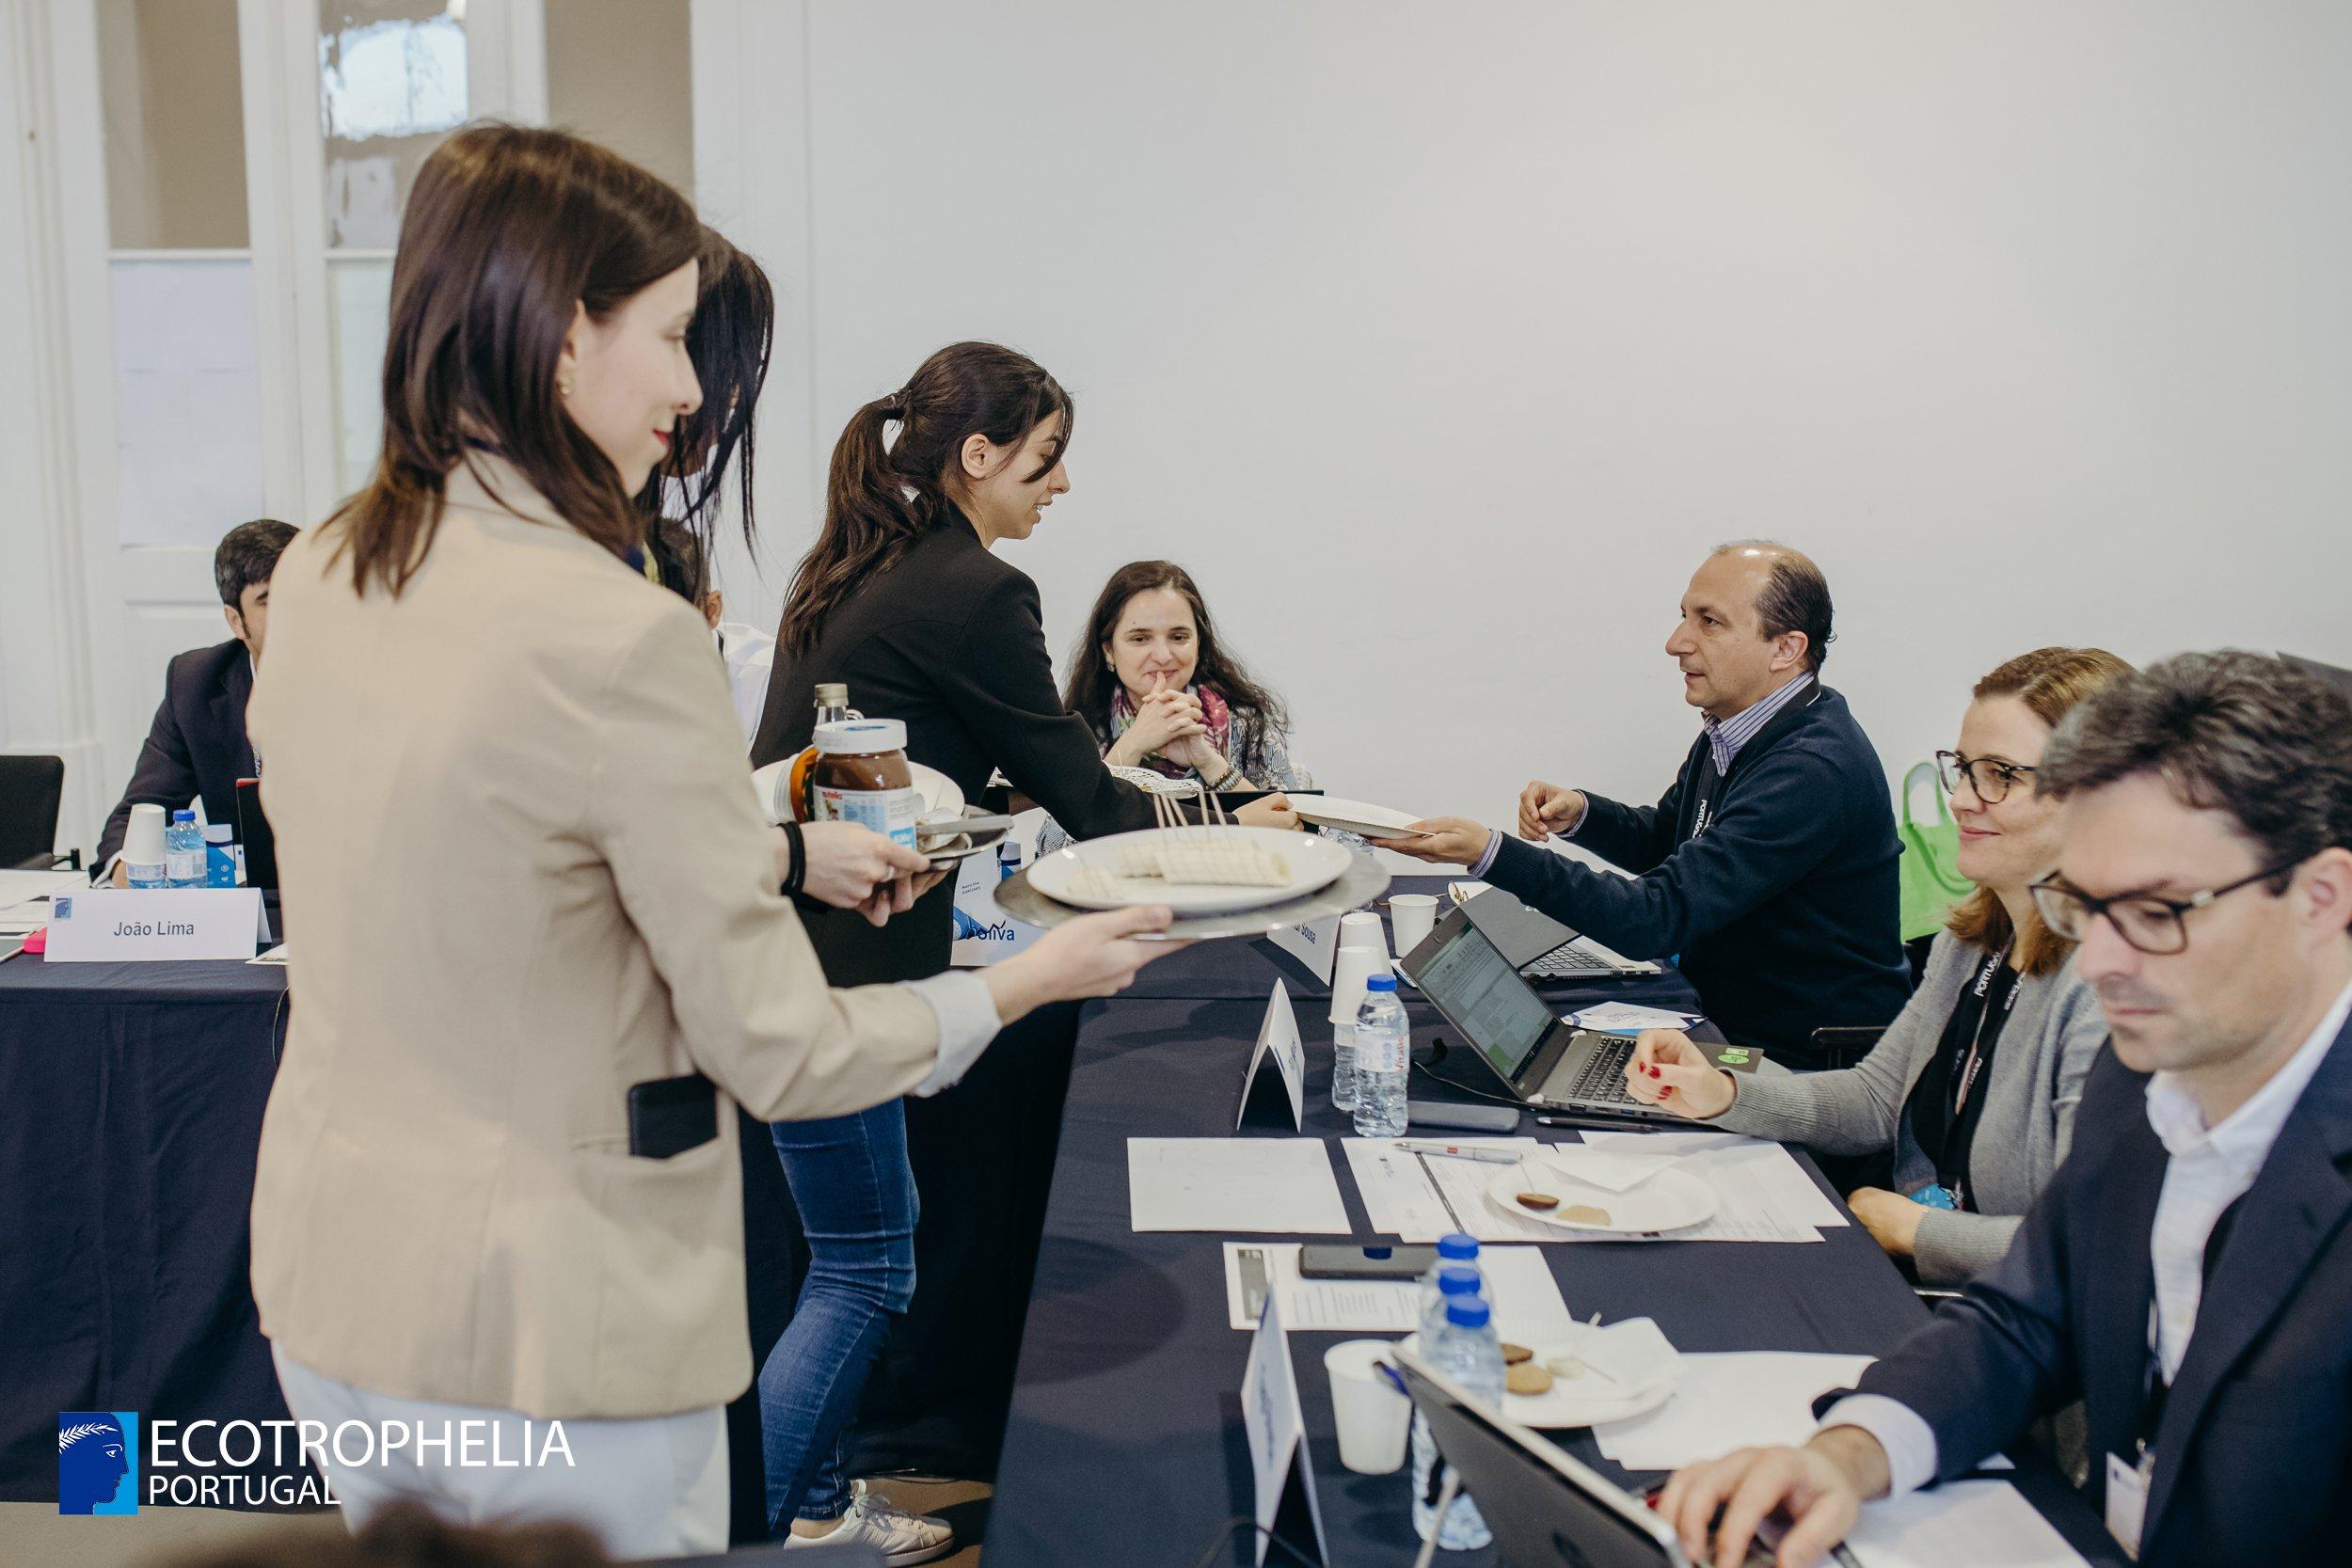 Ecotrophelia 2019 Market Access